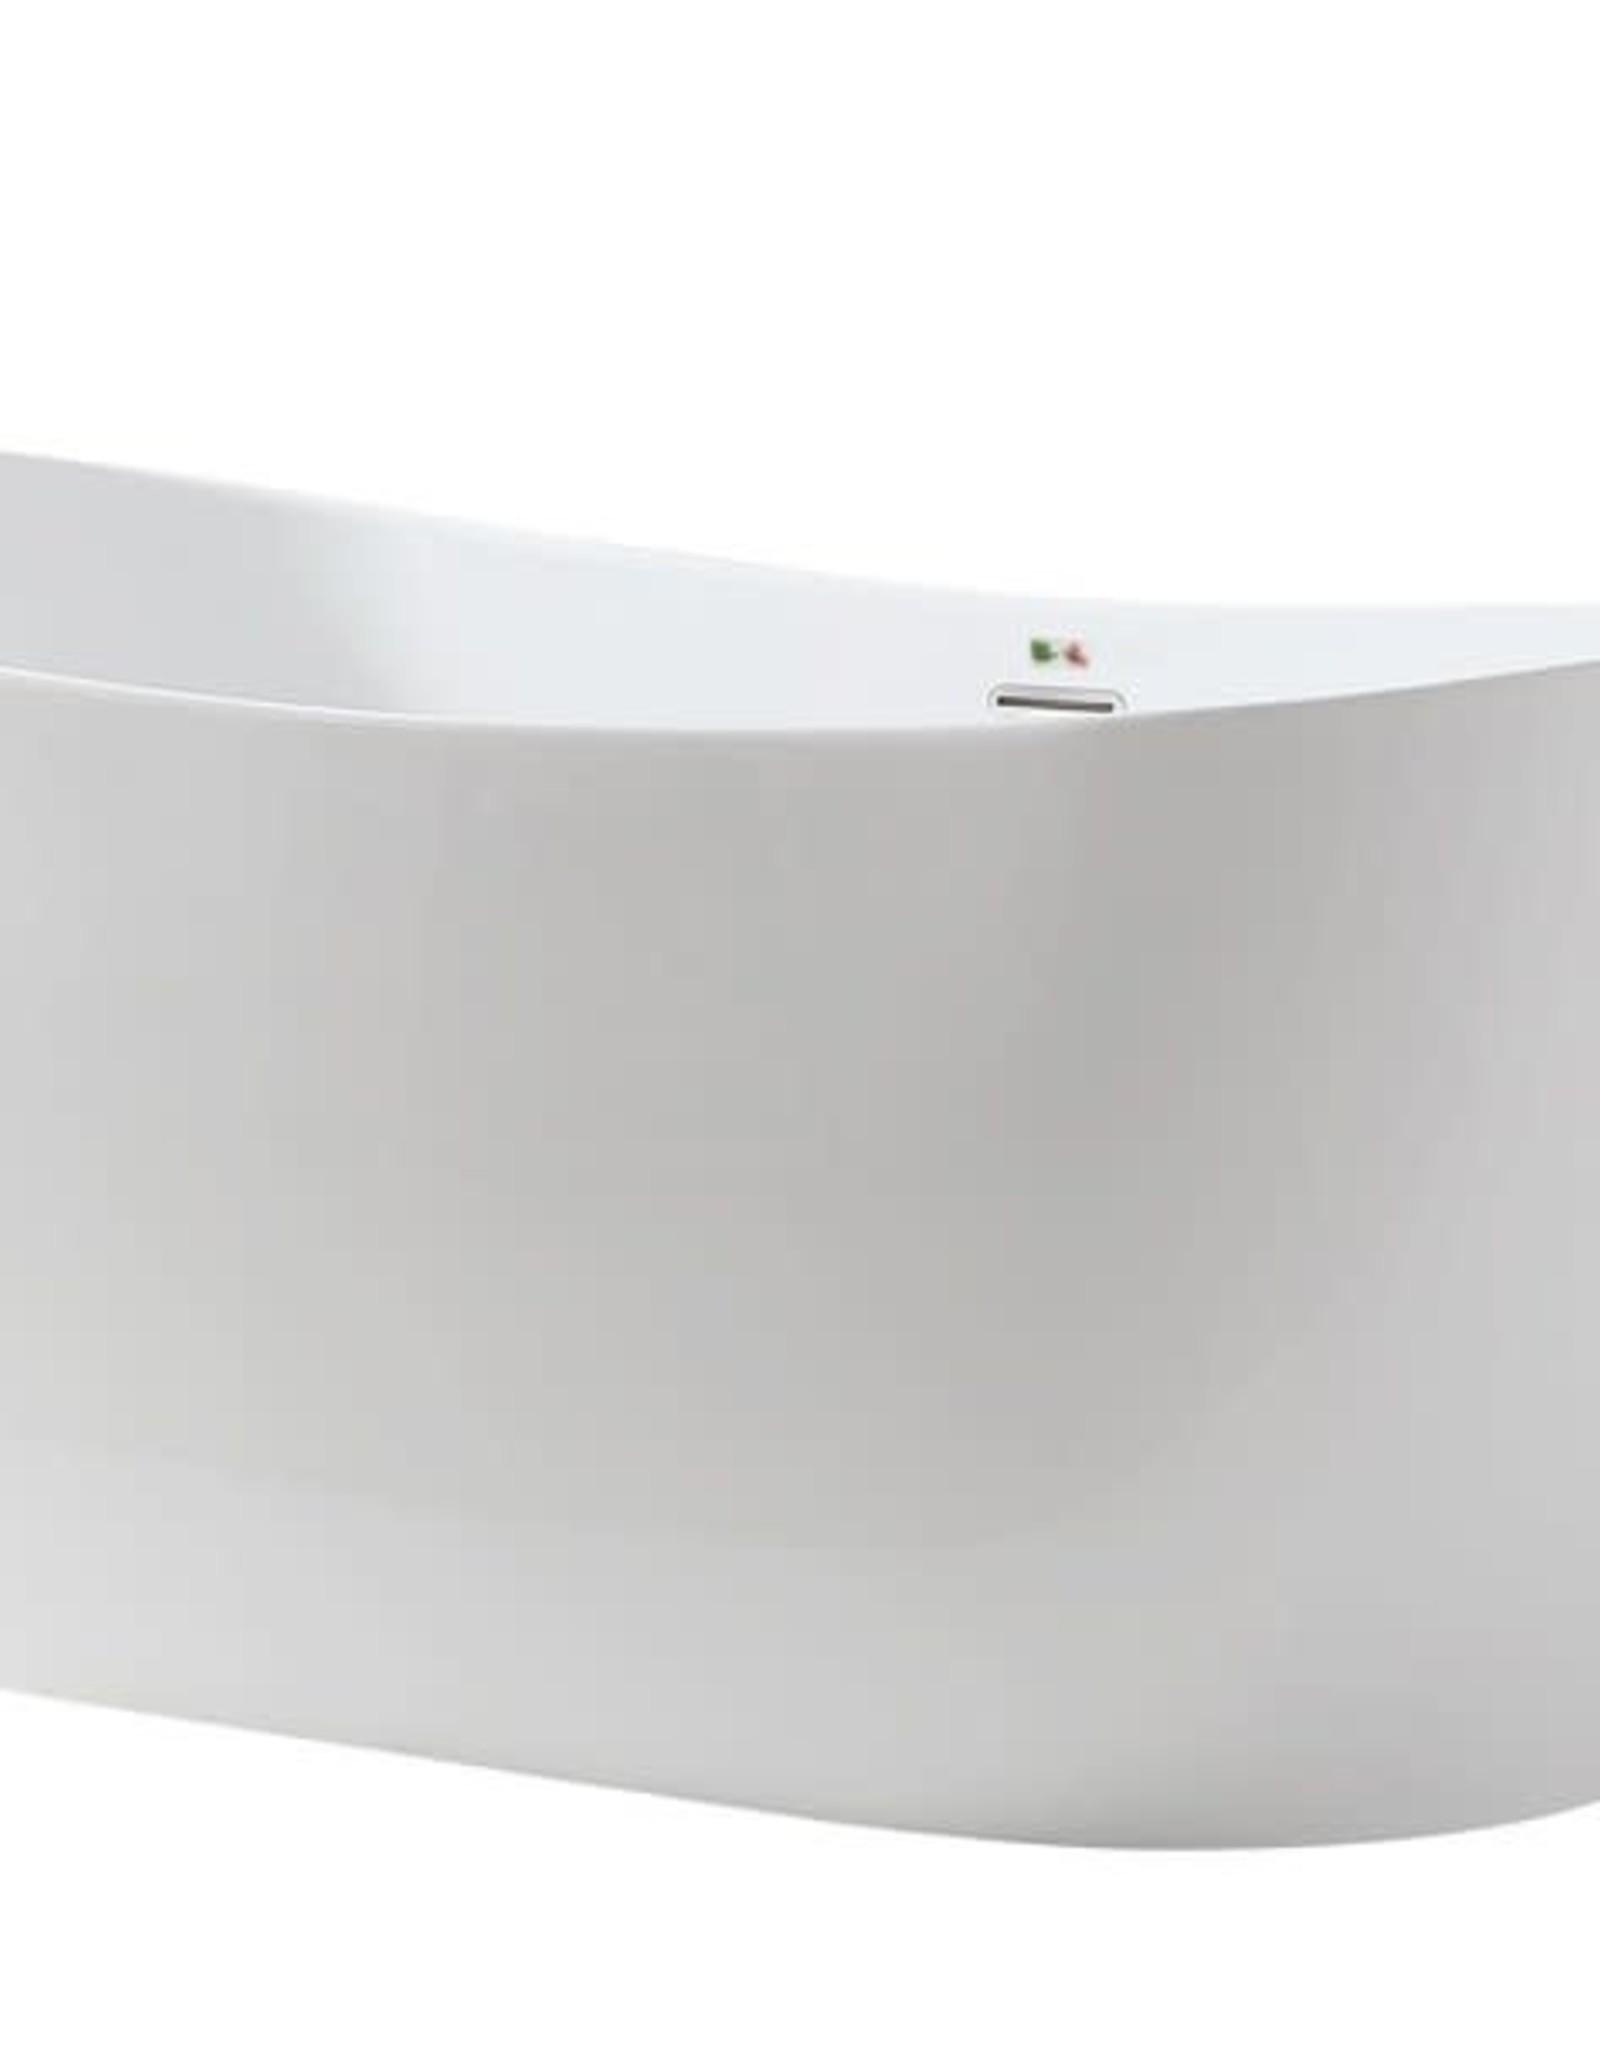 "Bagno Italia Bagno Italia Bellagio 60"" Freestanding Tub"